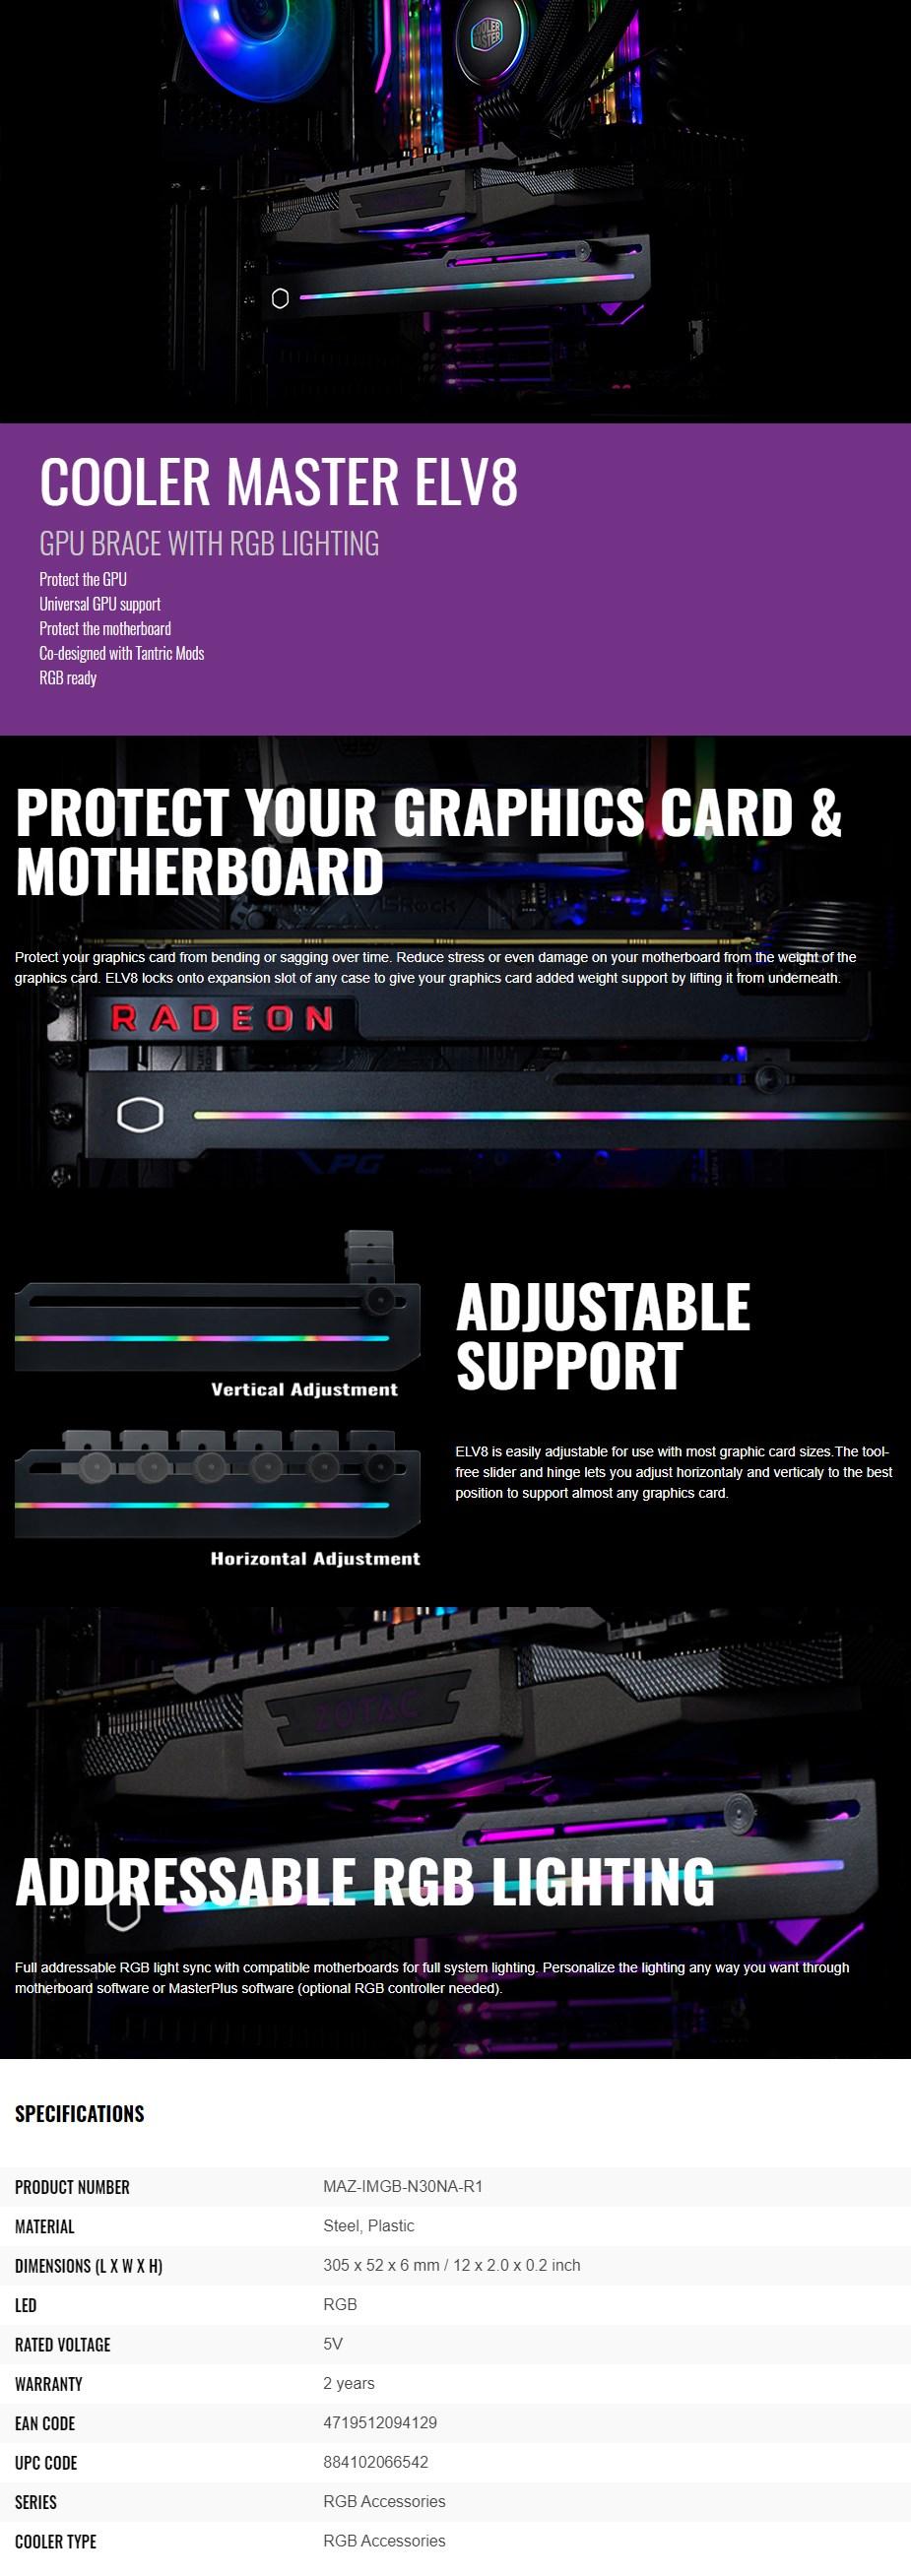 cooler-master-elv8-gpuaf-brace-with-rgb-lighting-ac30958-3.jpg